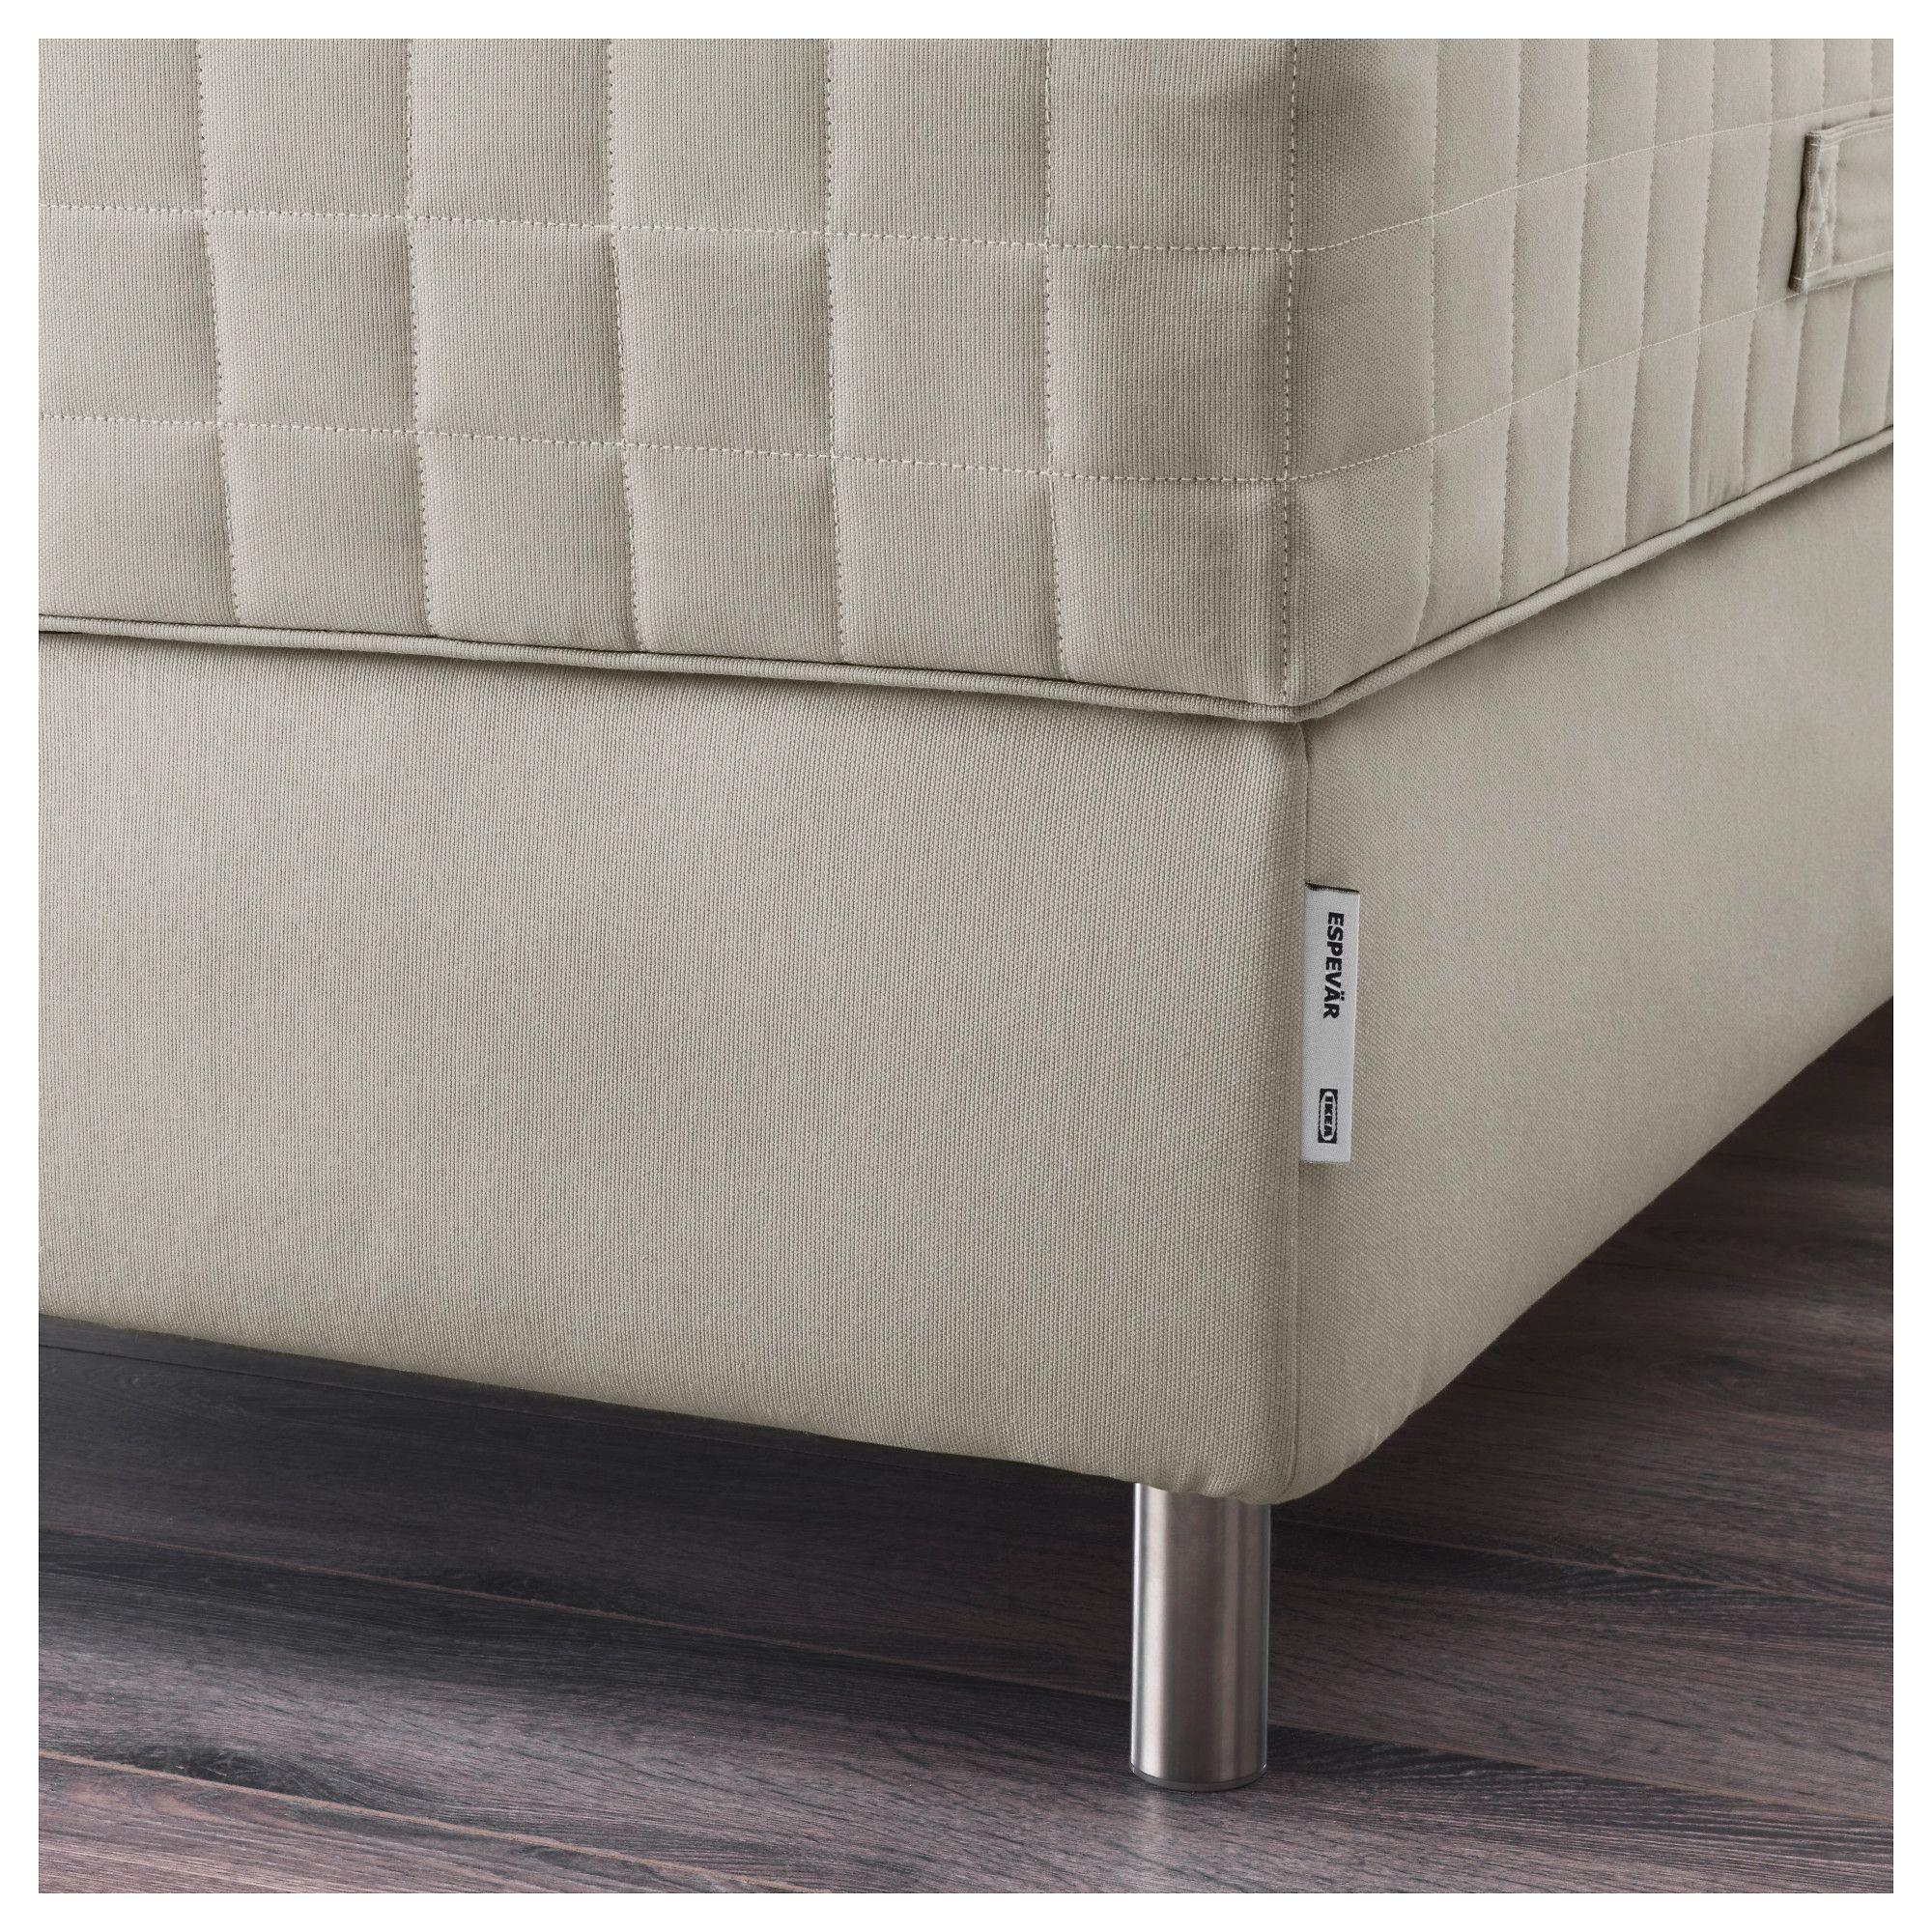 ESPEVR Slatted mattress base for bed frame